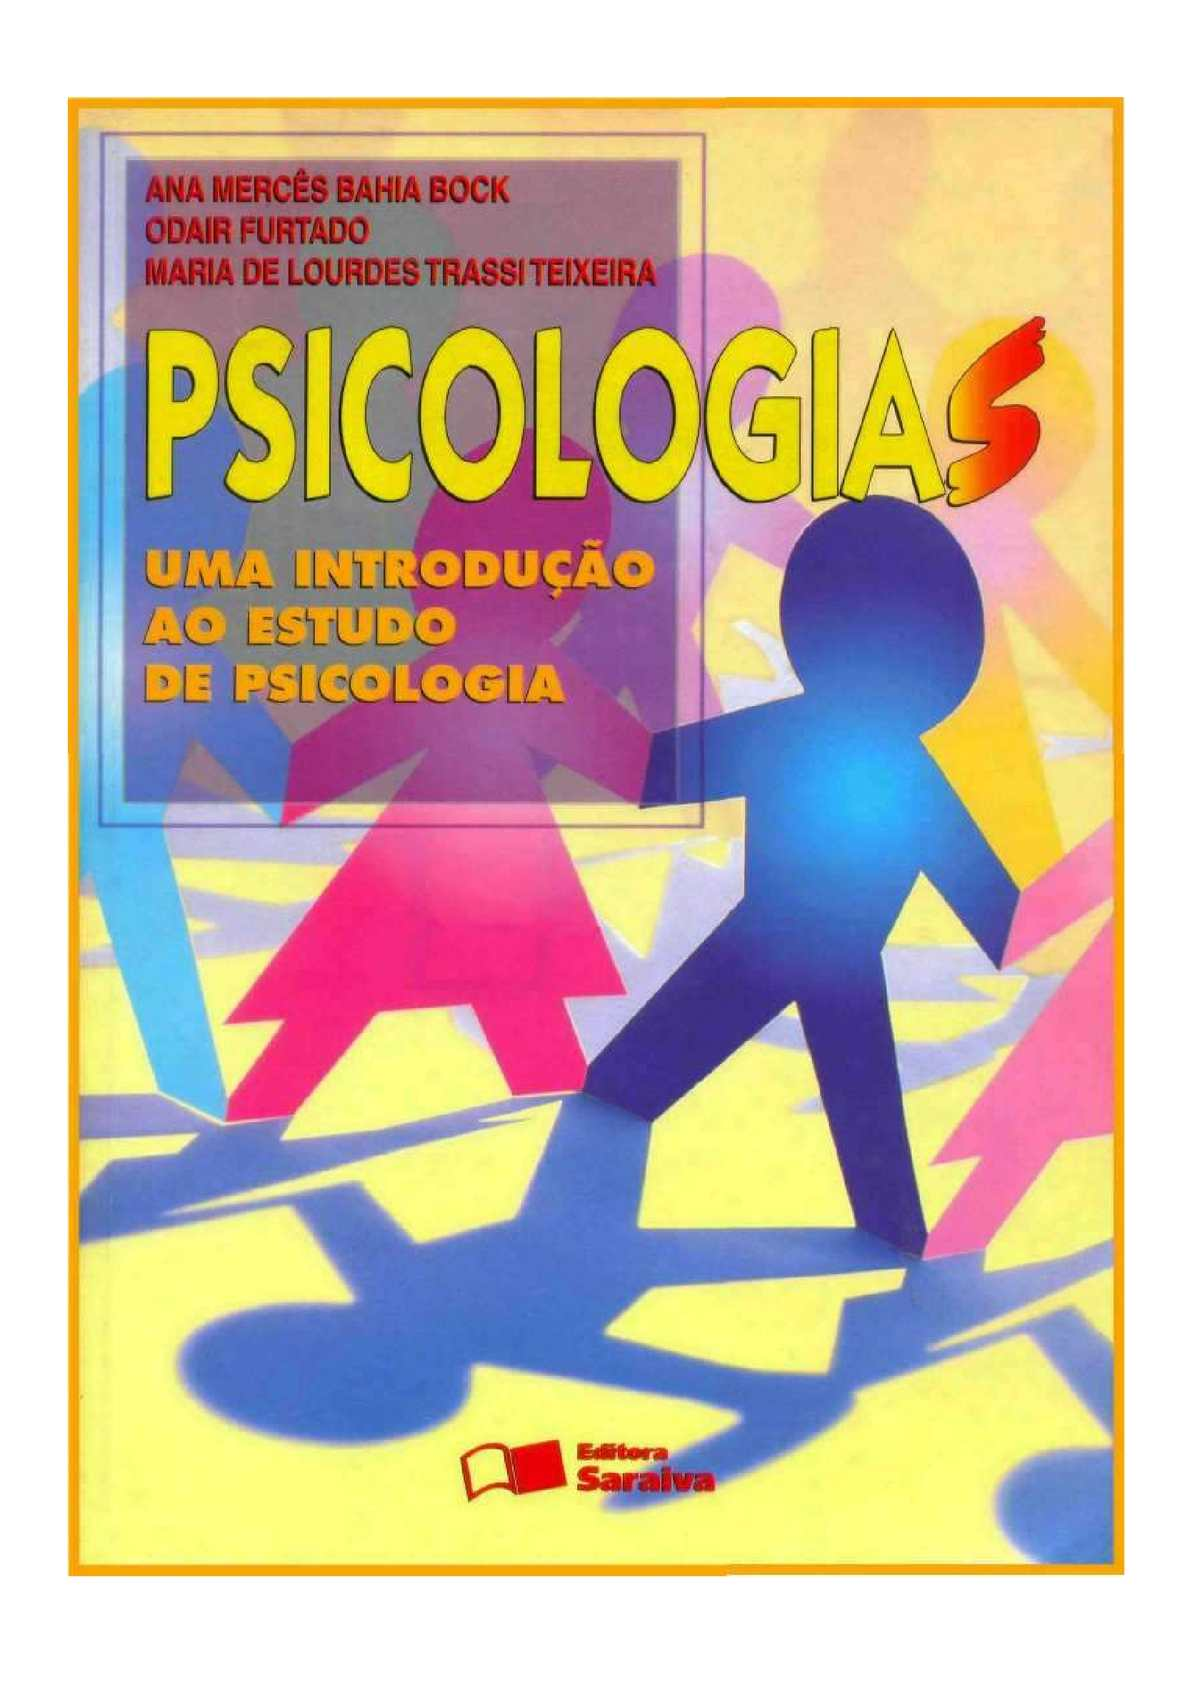 Terapia, Psicologia e Meditação - eBook - WOOK